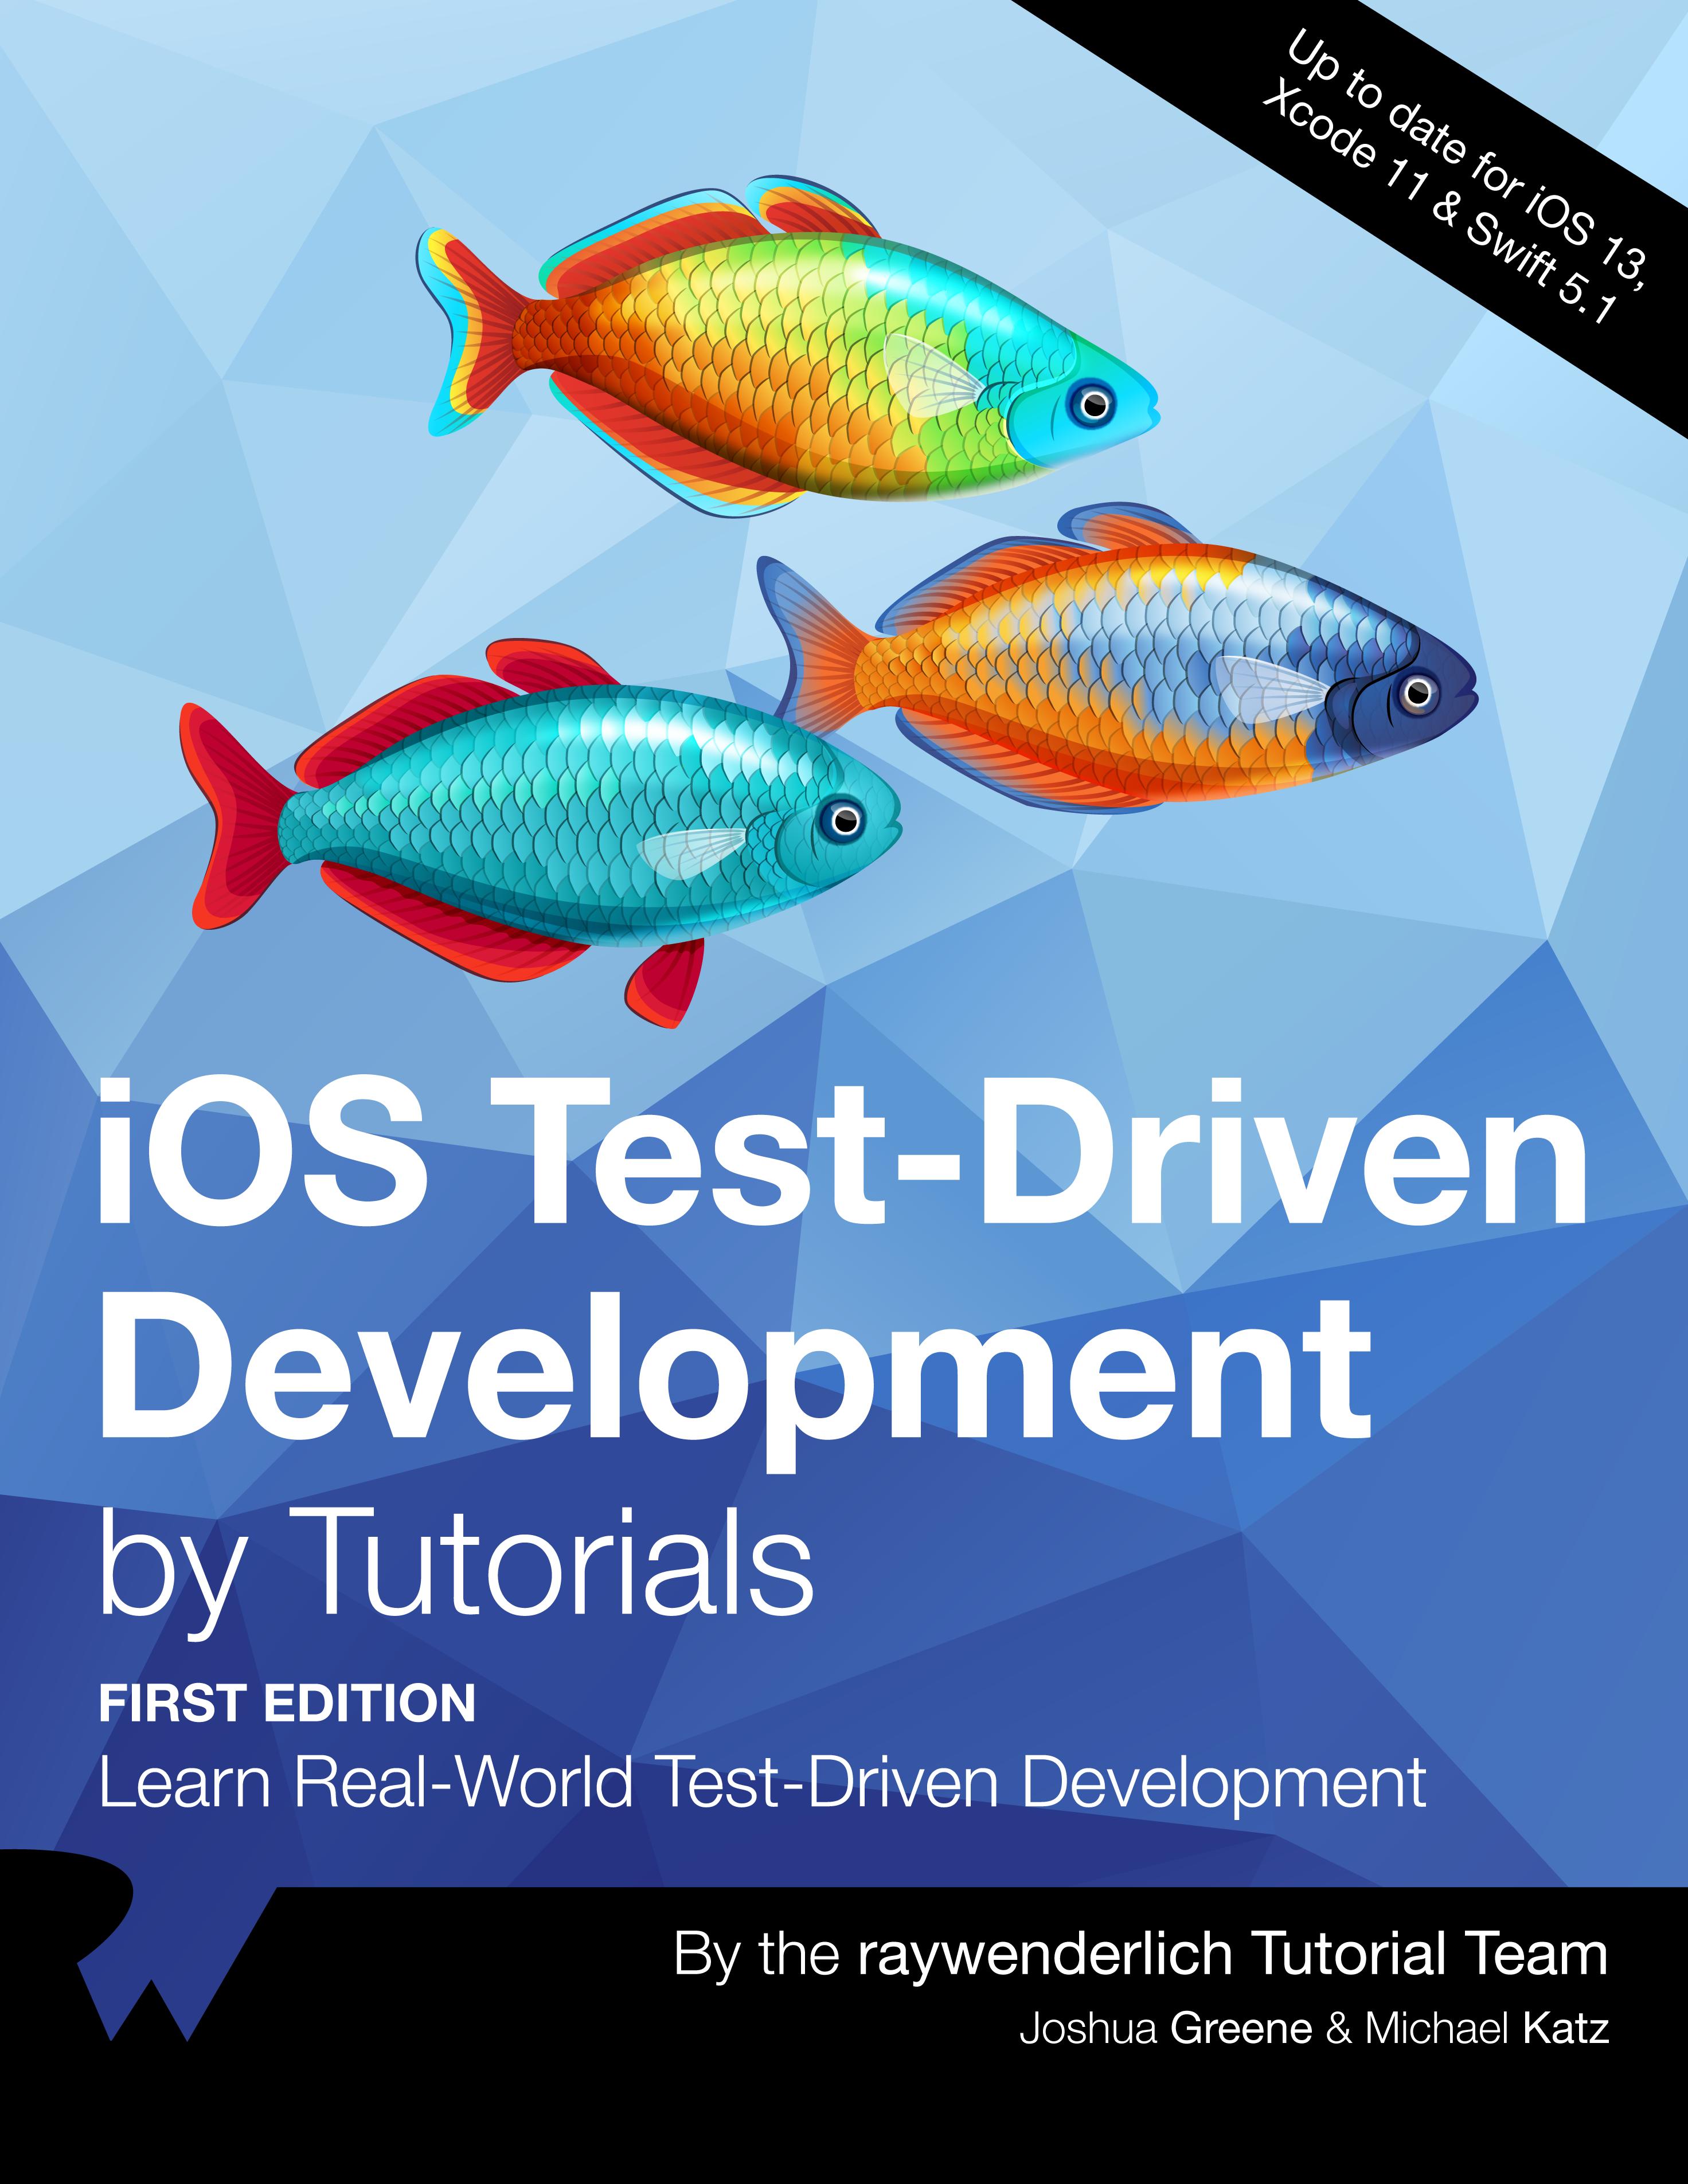 iOS Test-Driven Development by Tutorials